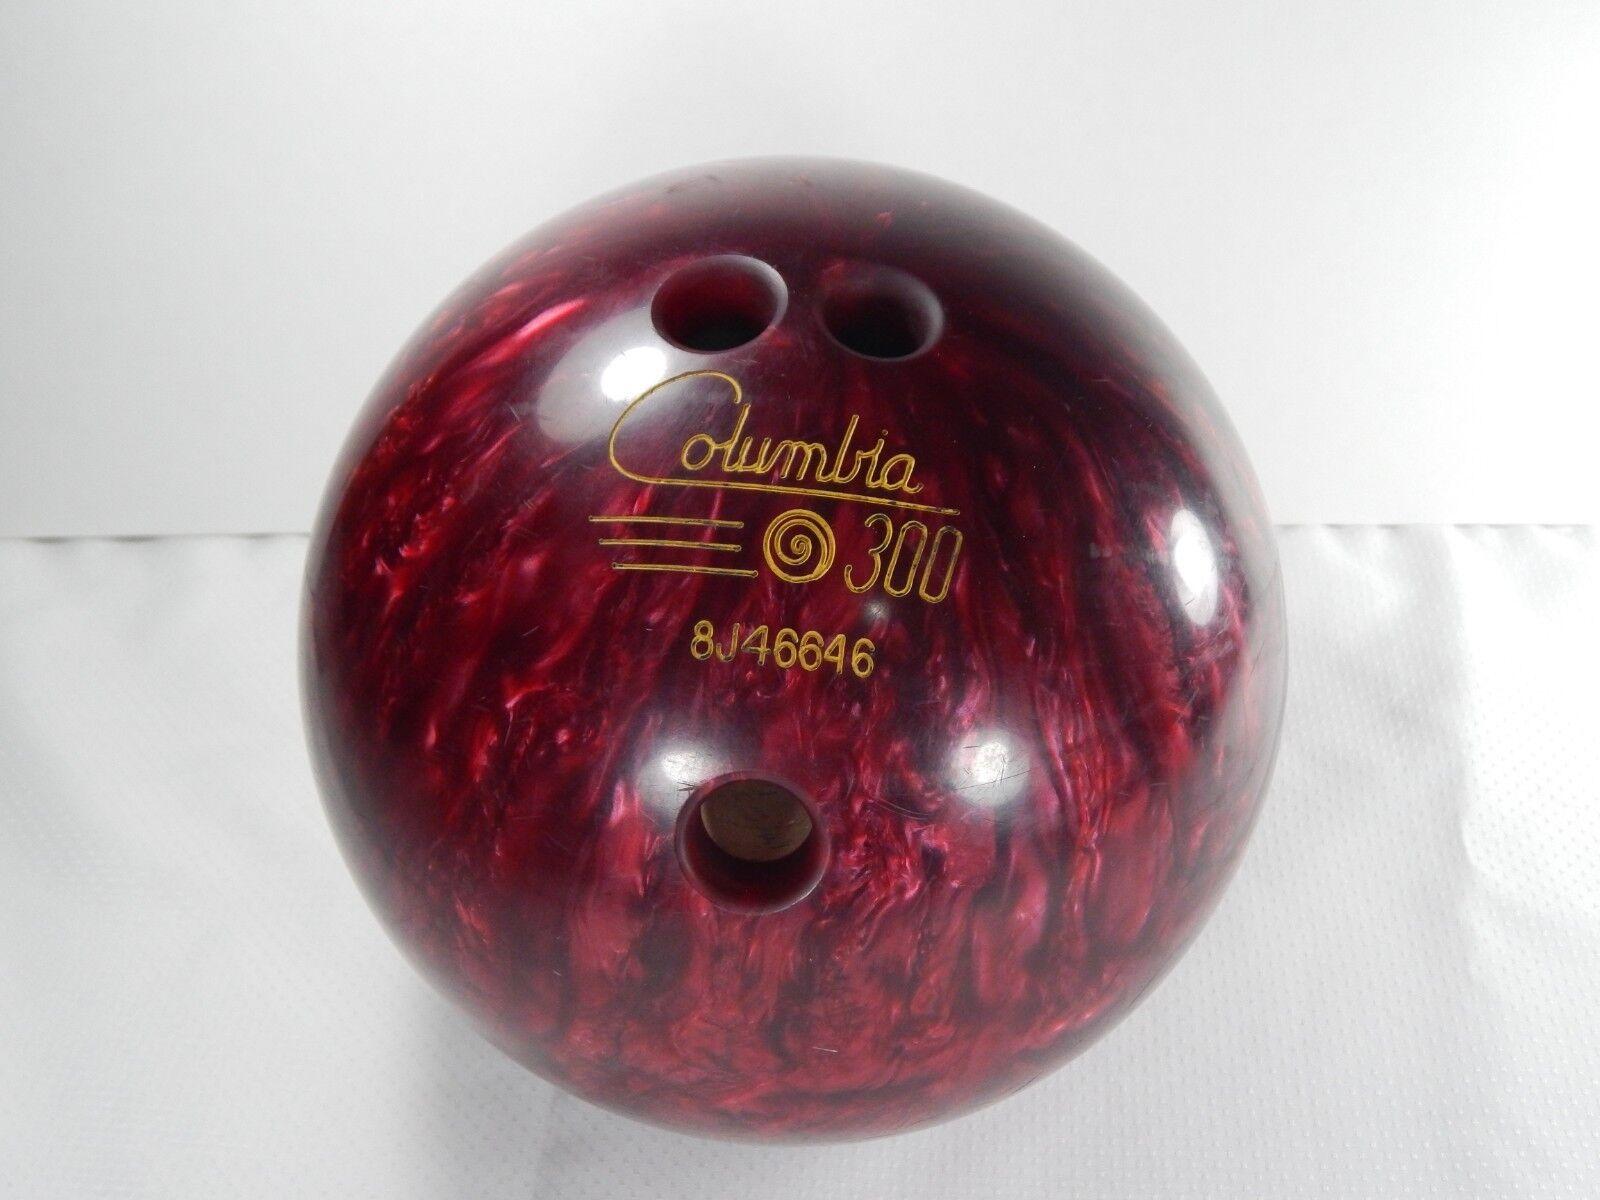 Columbia 300 Bowling Ball. Swirl Dot. Candy Red. 11lb